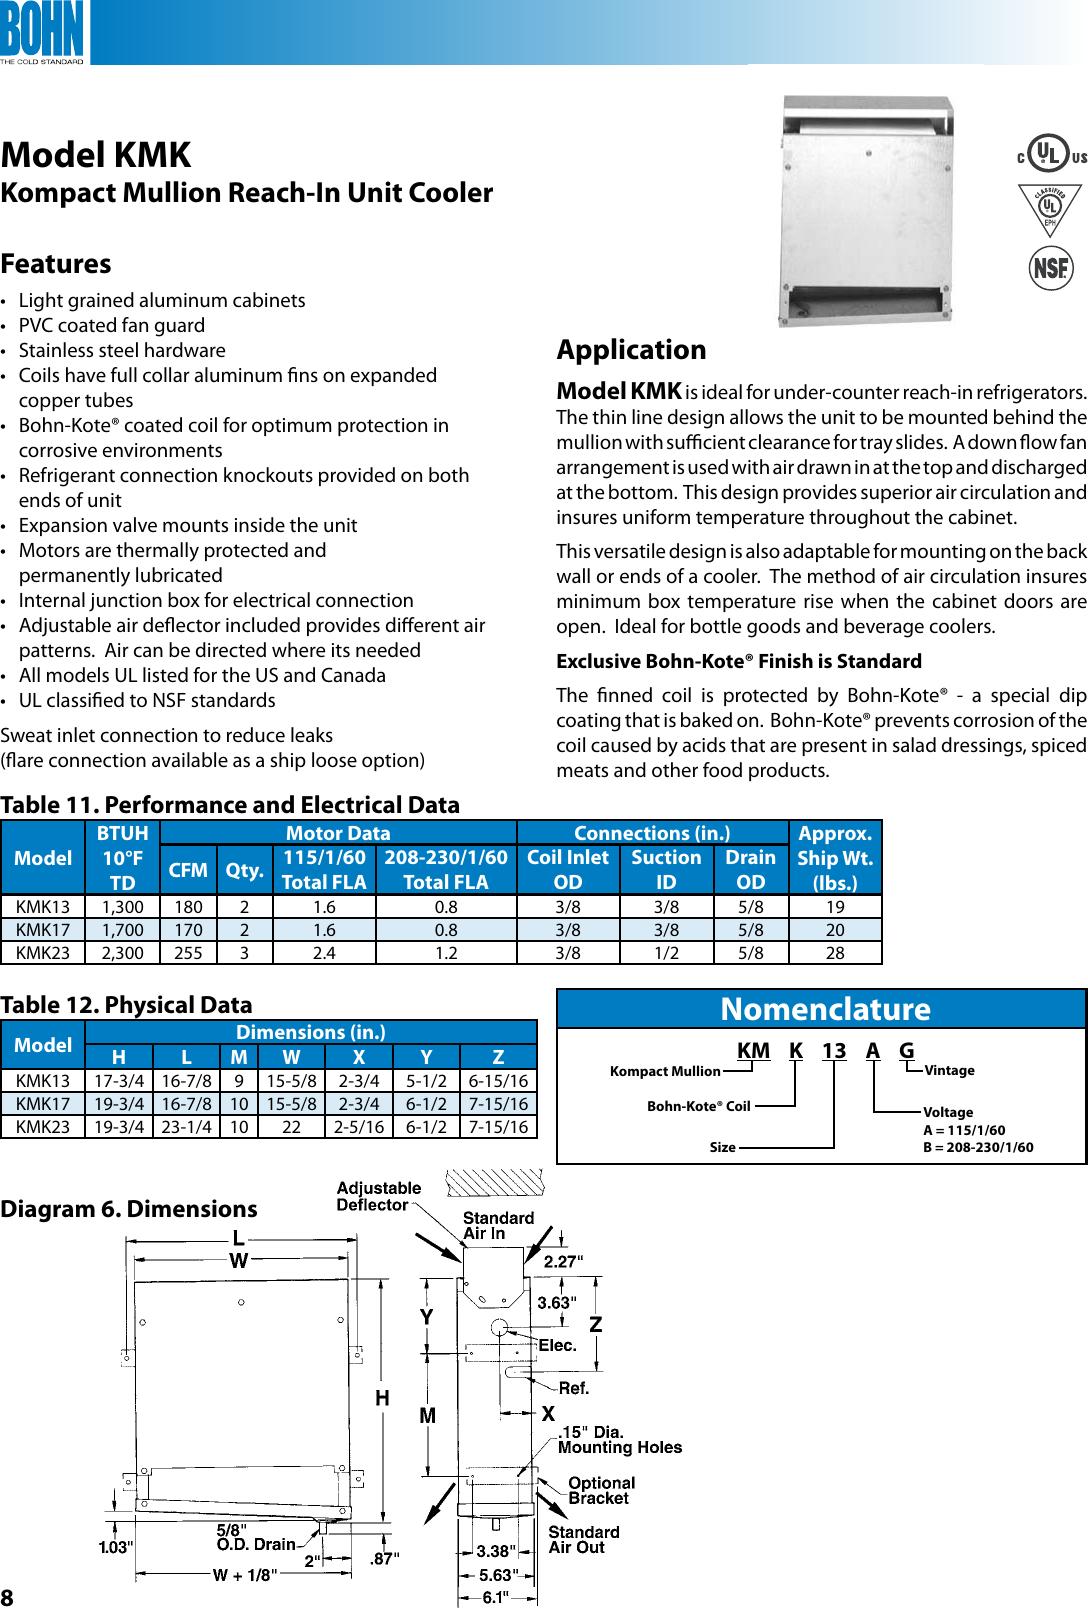 Heatcraft Freezer Wiring Diagram Undercounter - Trusted Wiring Diagram